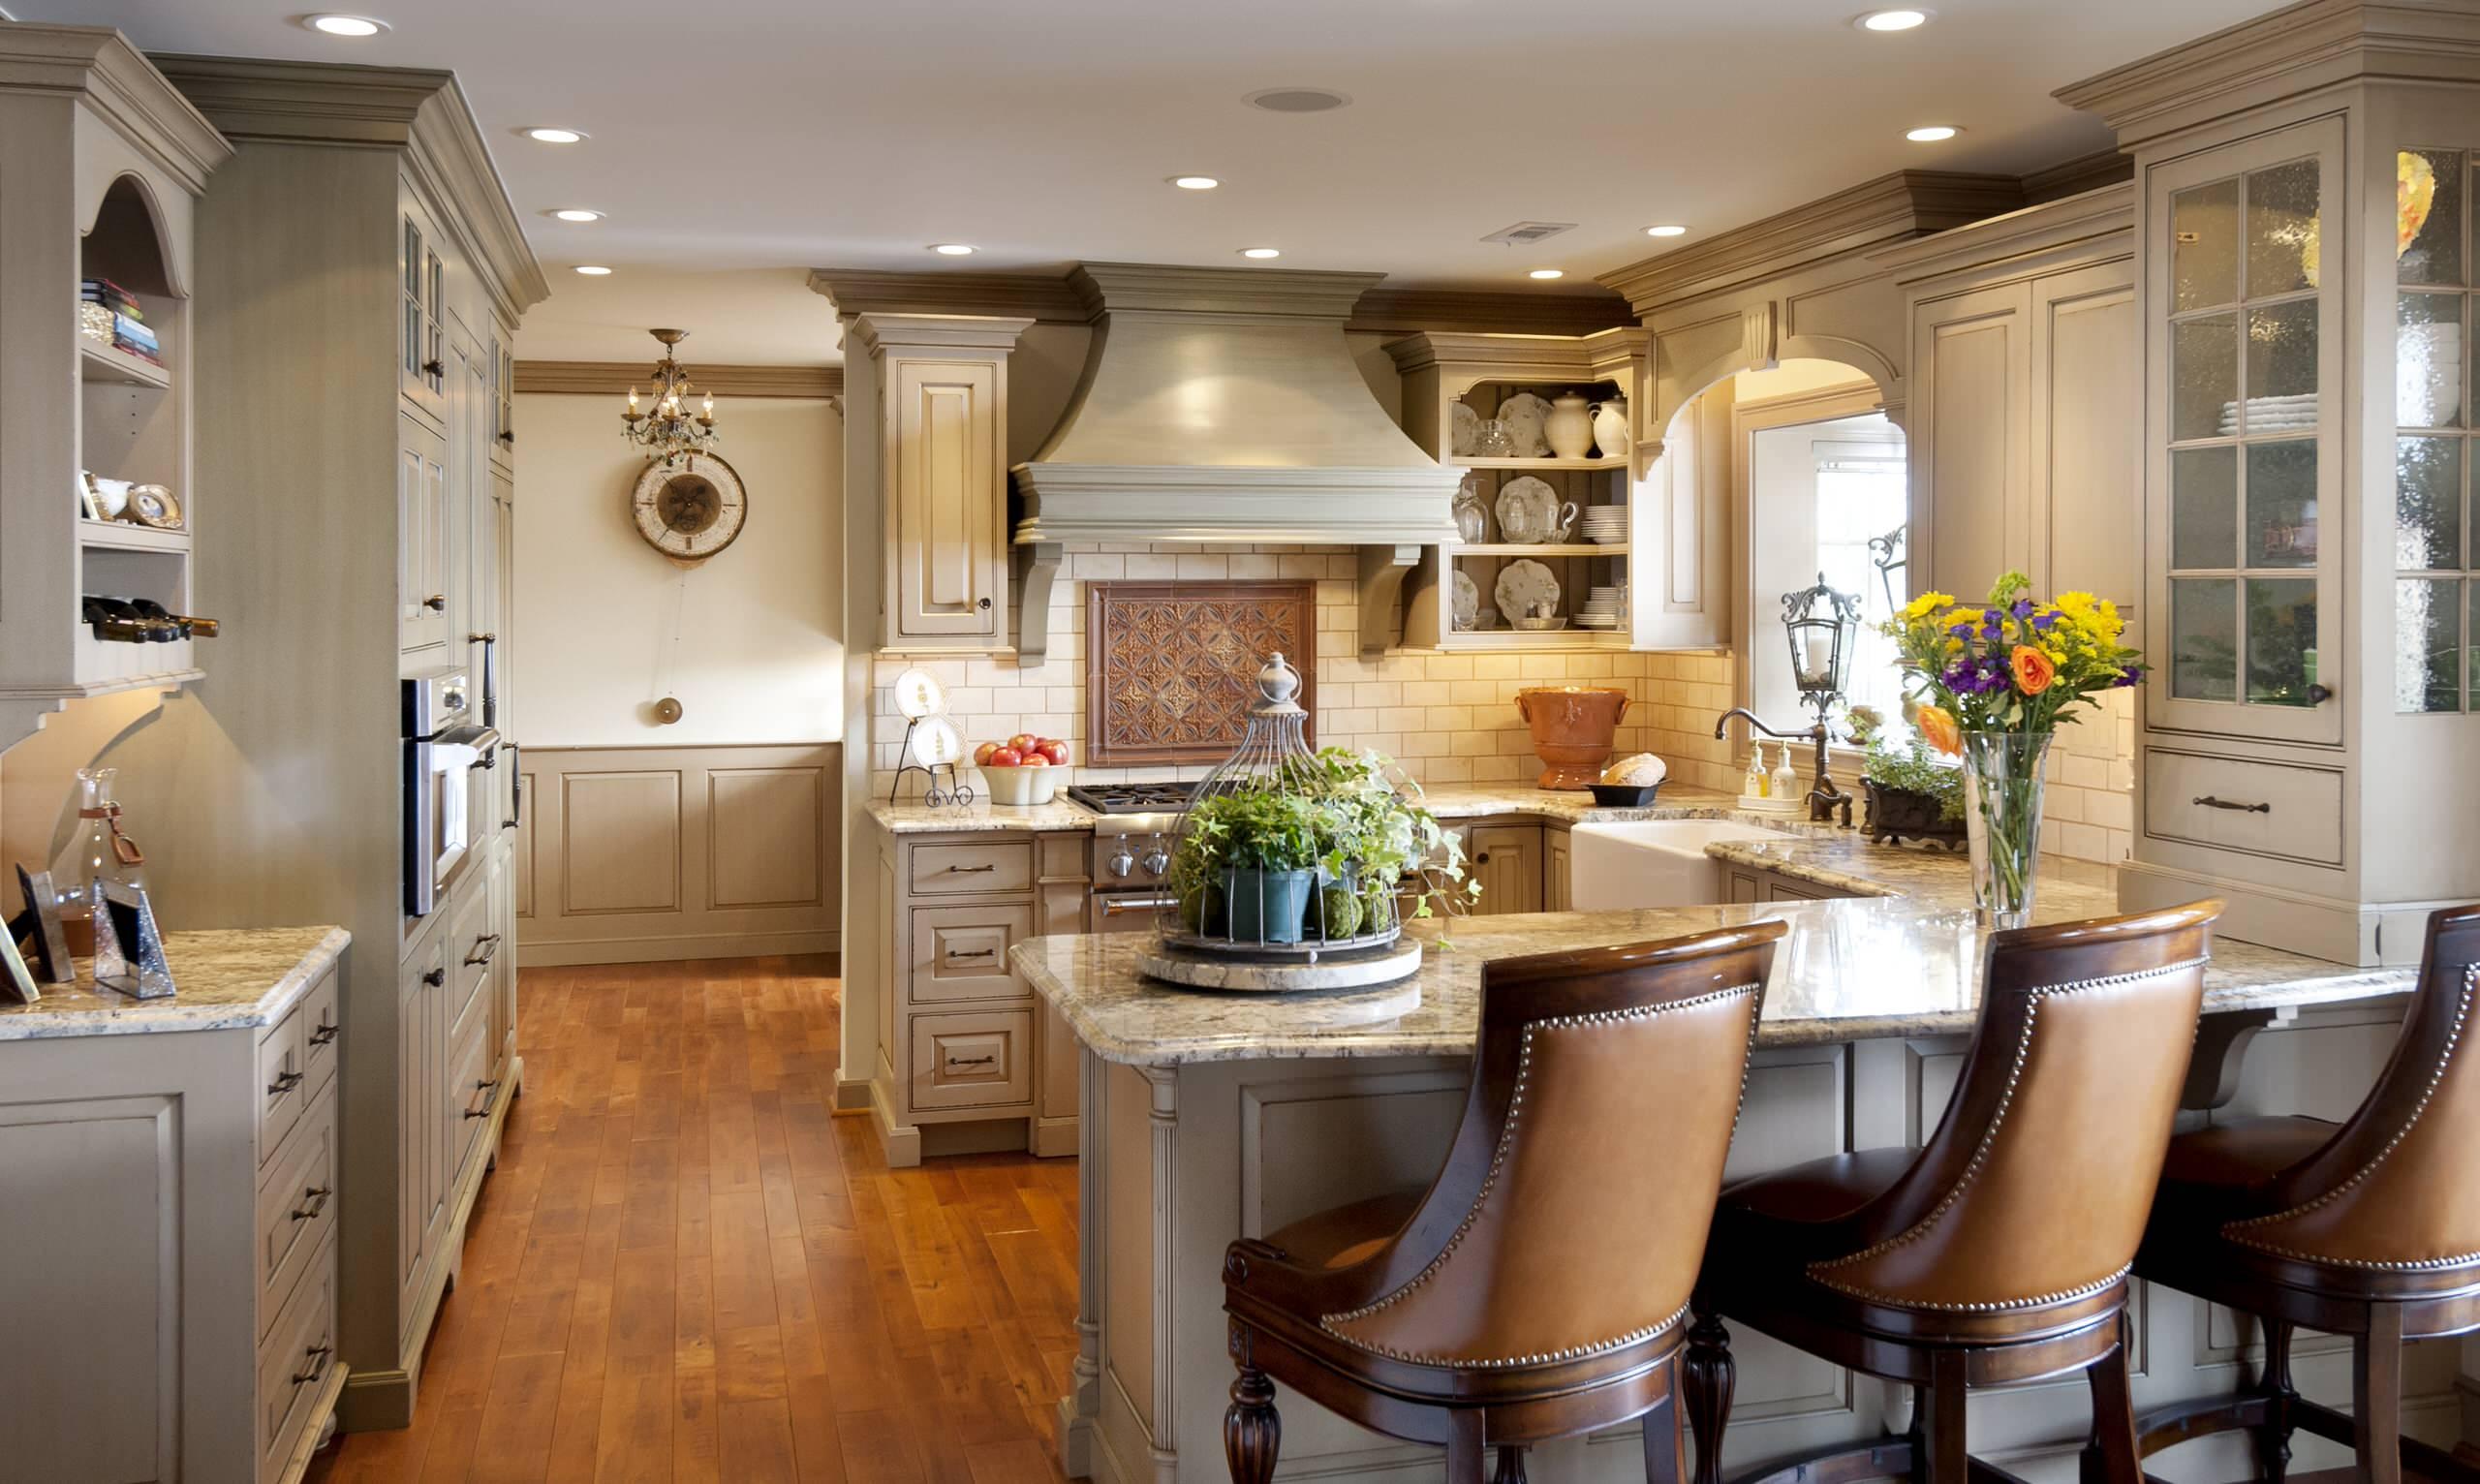 U Shaped Kitchen Designs Traditional Kitchen Beadboard Beige Chandelier Farmhouse Table Pendant Lighting Runner Tile Backsplash White Cabinets Wood Floors